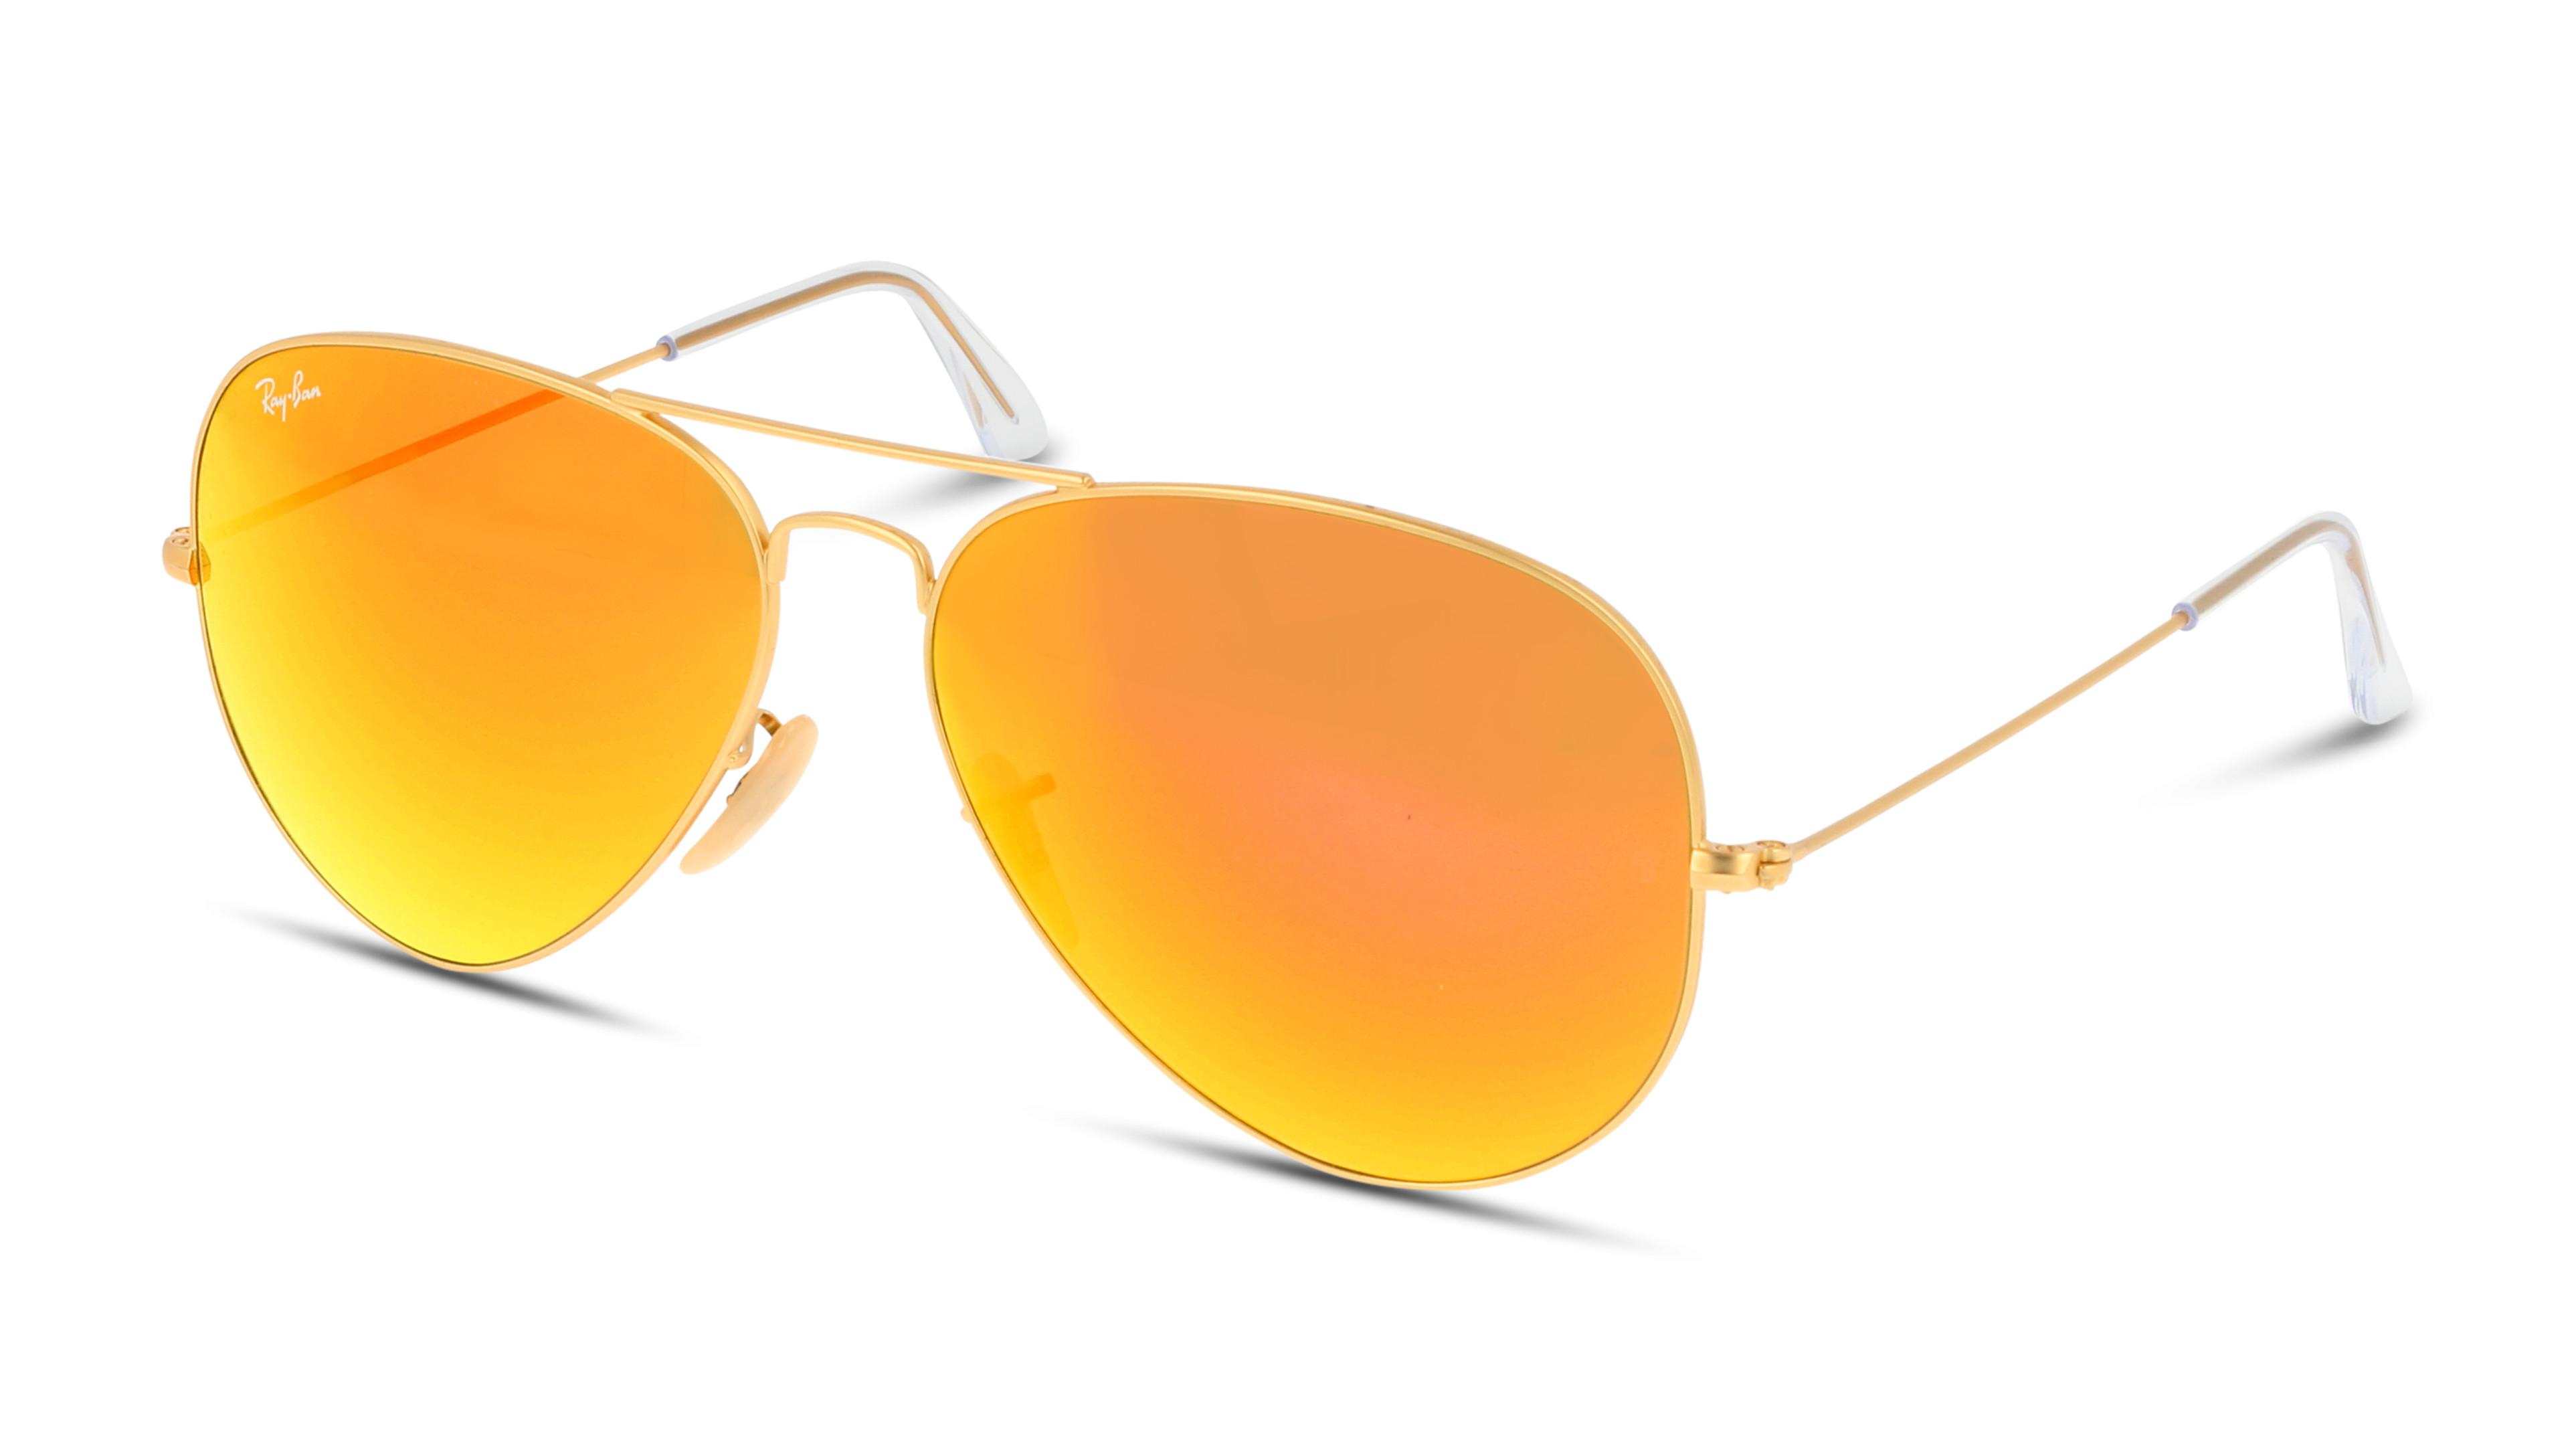 8053672000528-angle-01-rayban-glasses-eyewear-pair